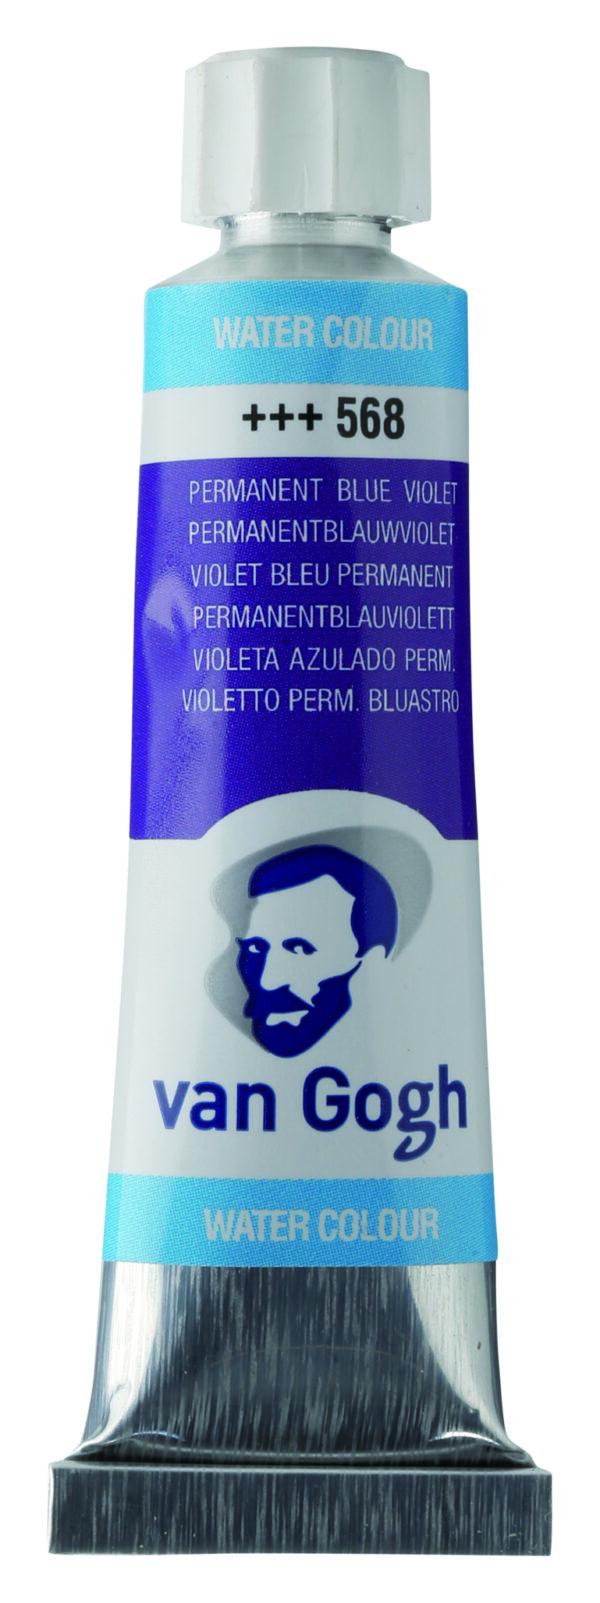 Van Gogh 568 Permanent blue violet - 10 ml